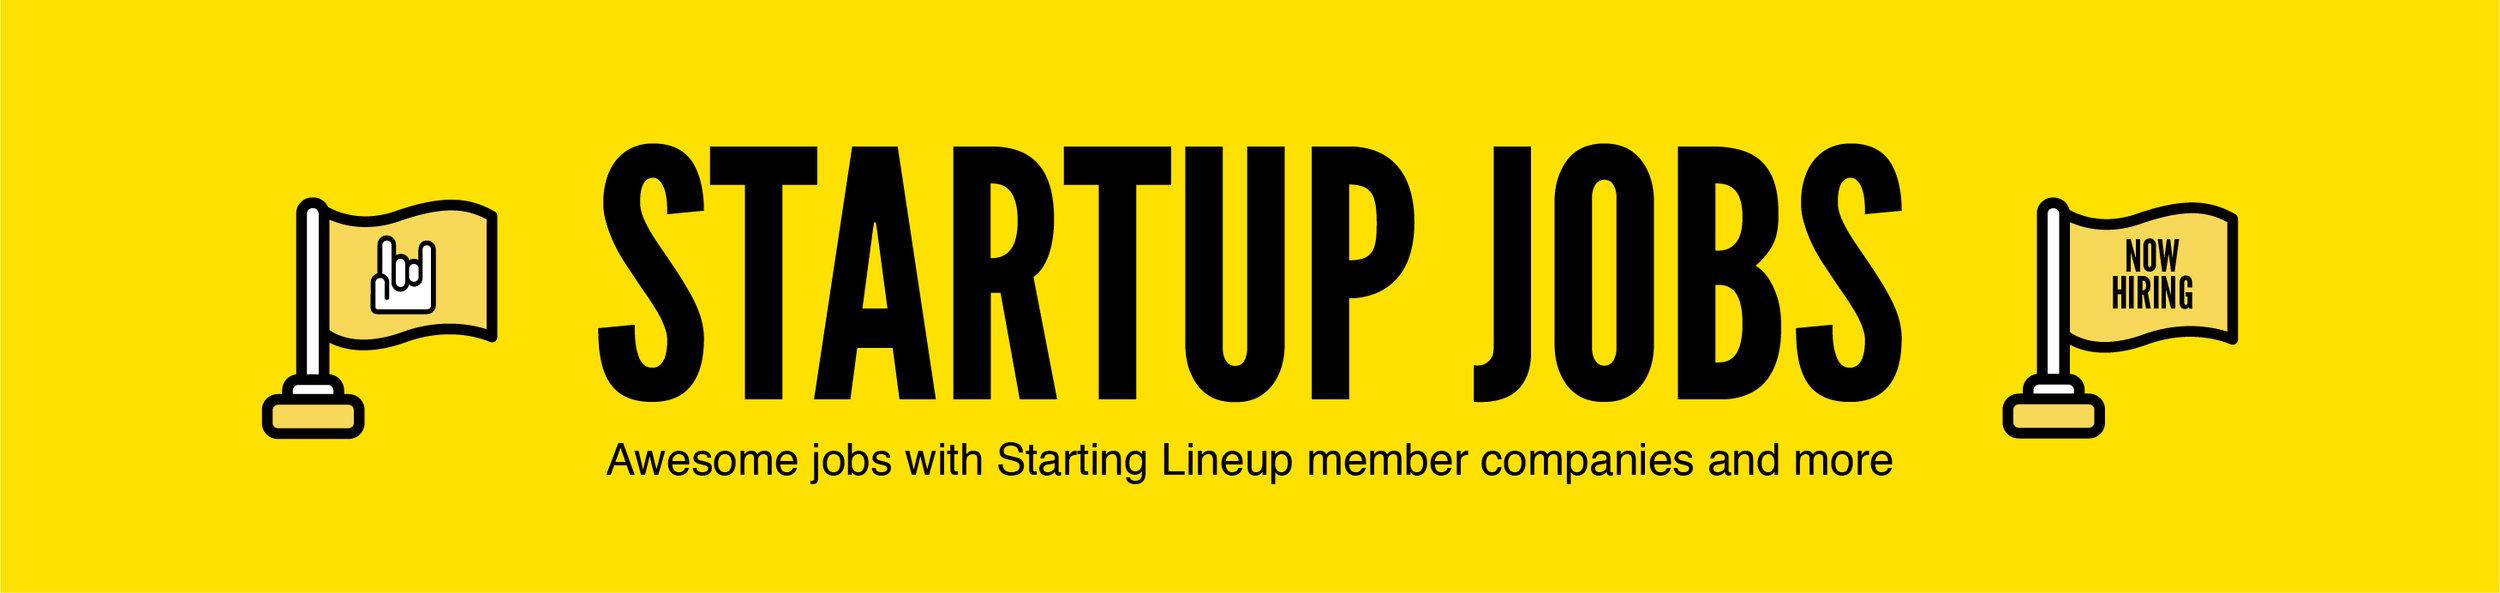 startup jobs.jpg